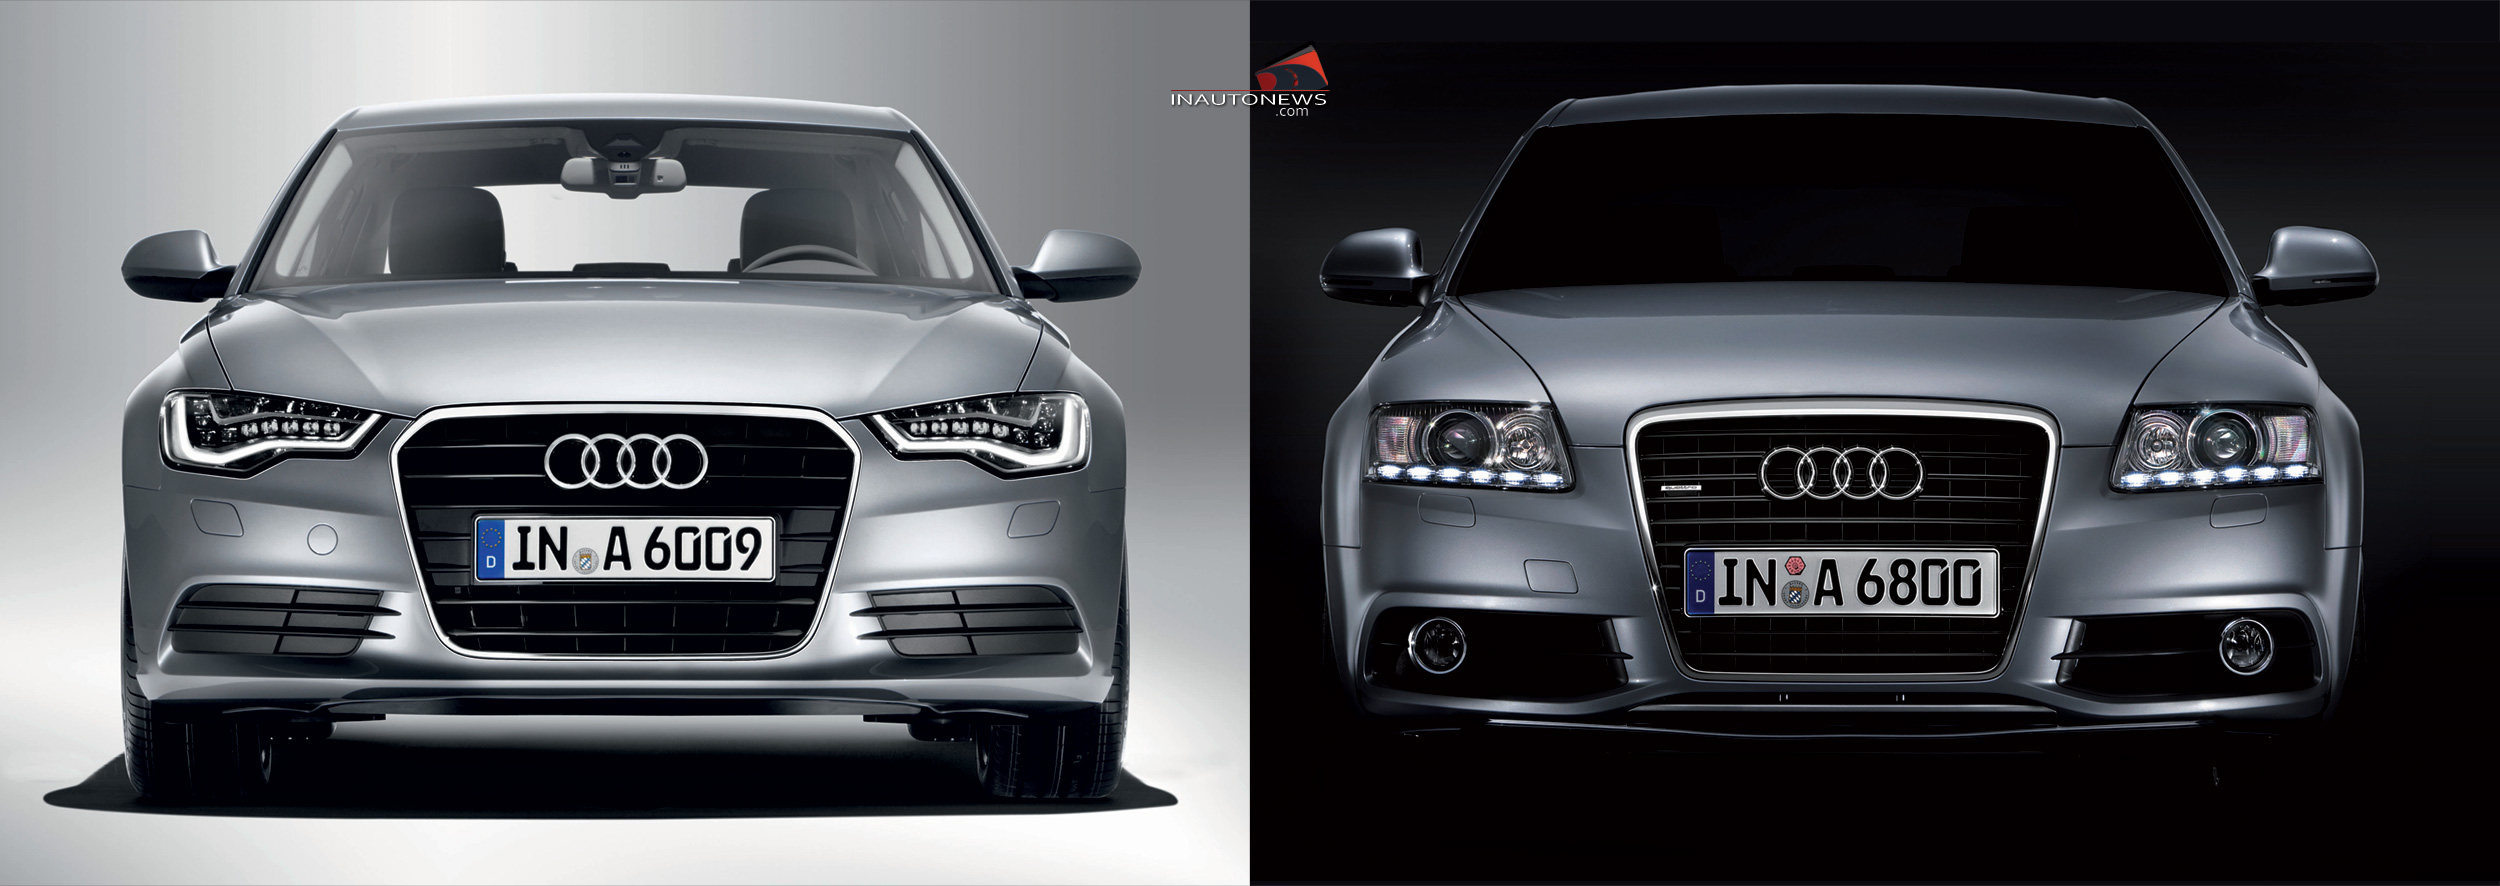 2010 Audi A6 Image 17